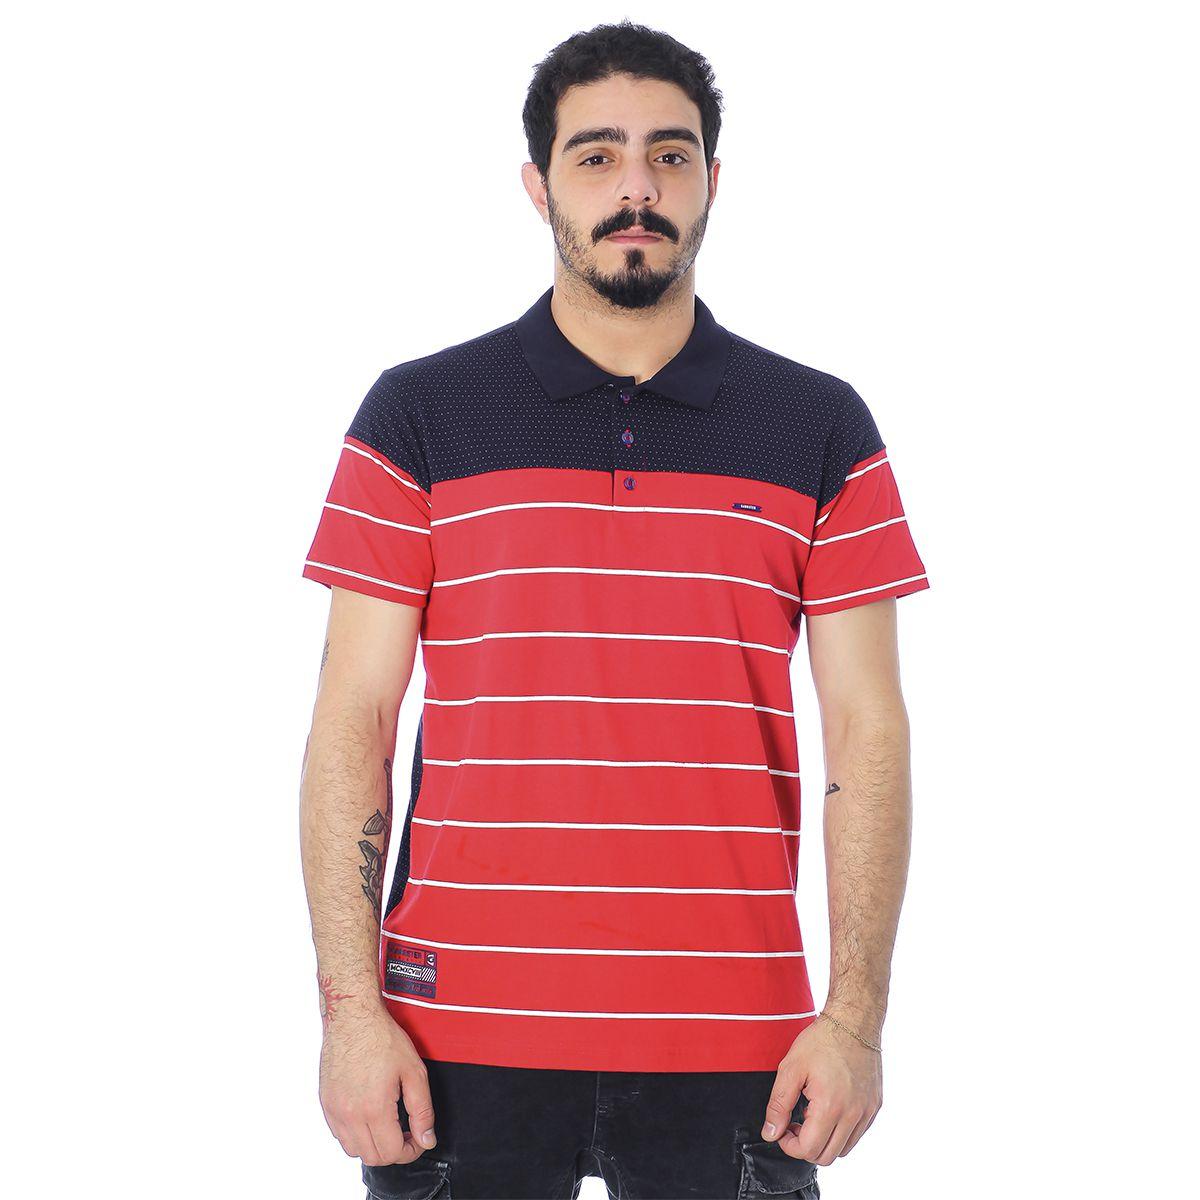 Camisa Polo Masculina Gangster 29.07.0628